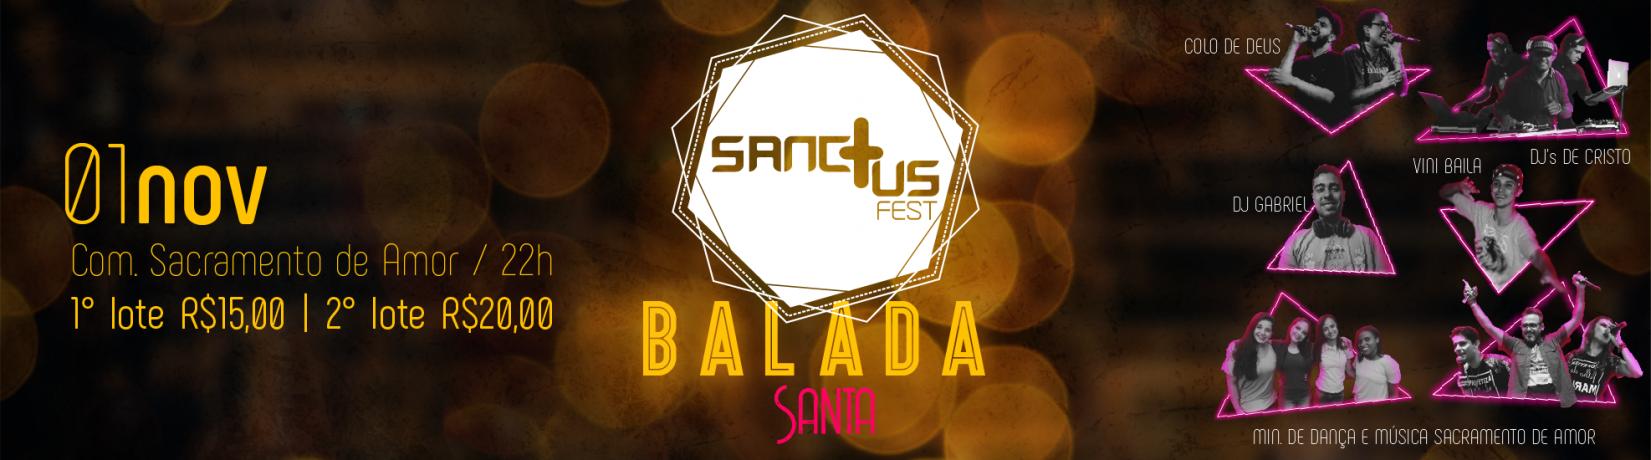 Sanctus Fest, Balada Santa, Sacramento de Amor,